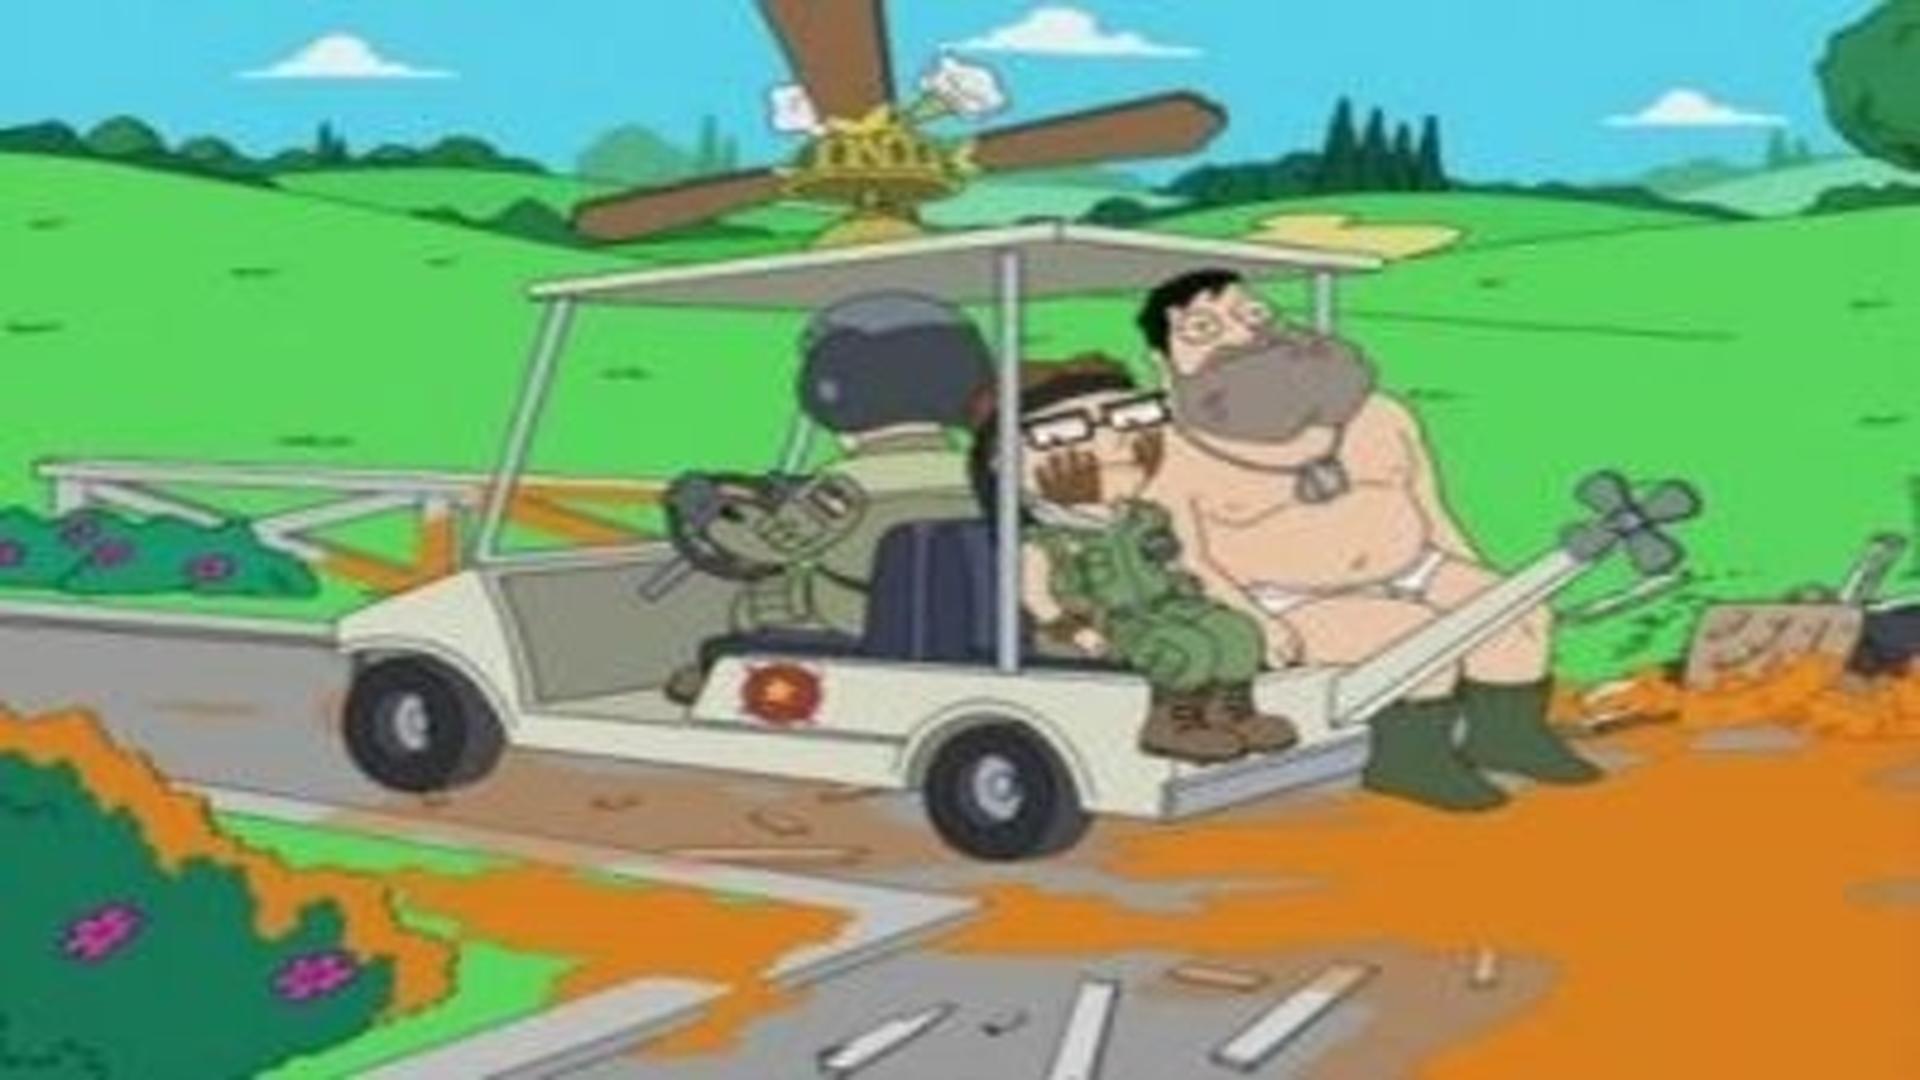 American Dad S06e01 In Country Club Summary Season 6